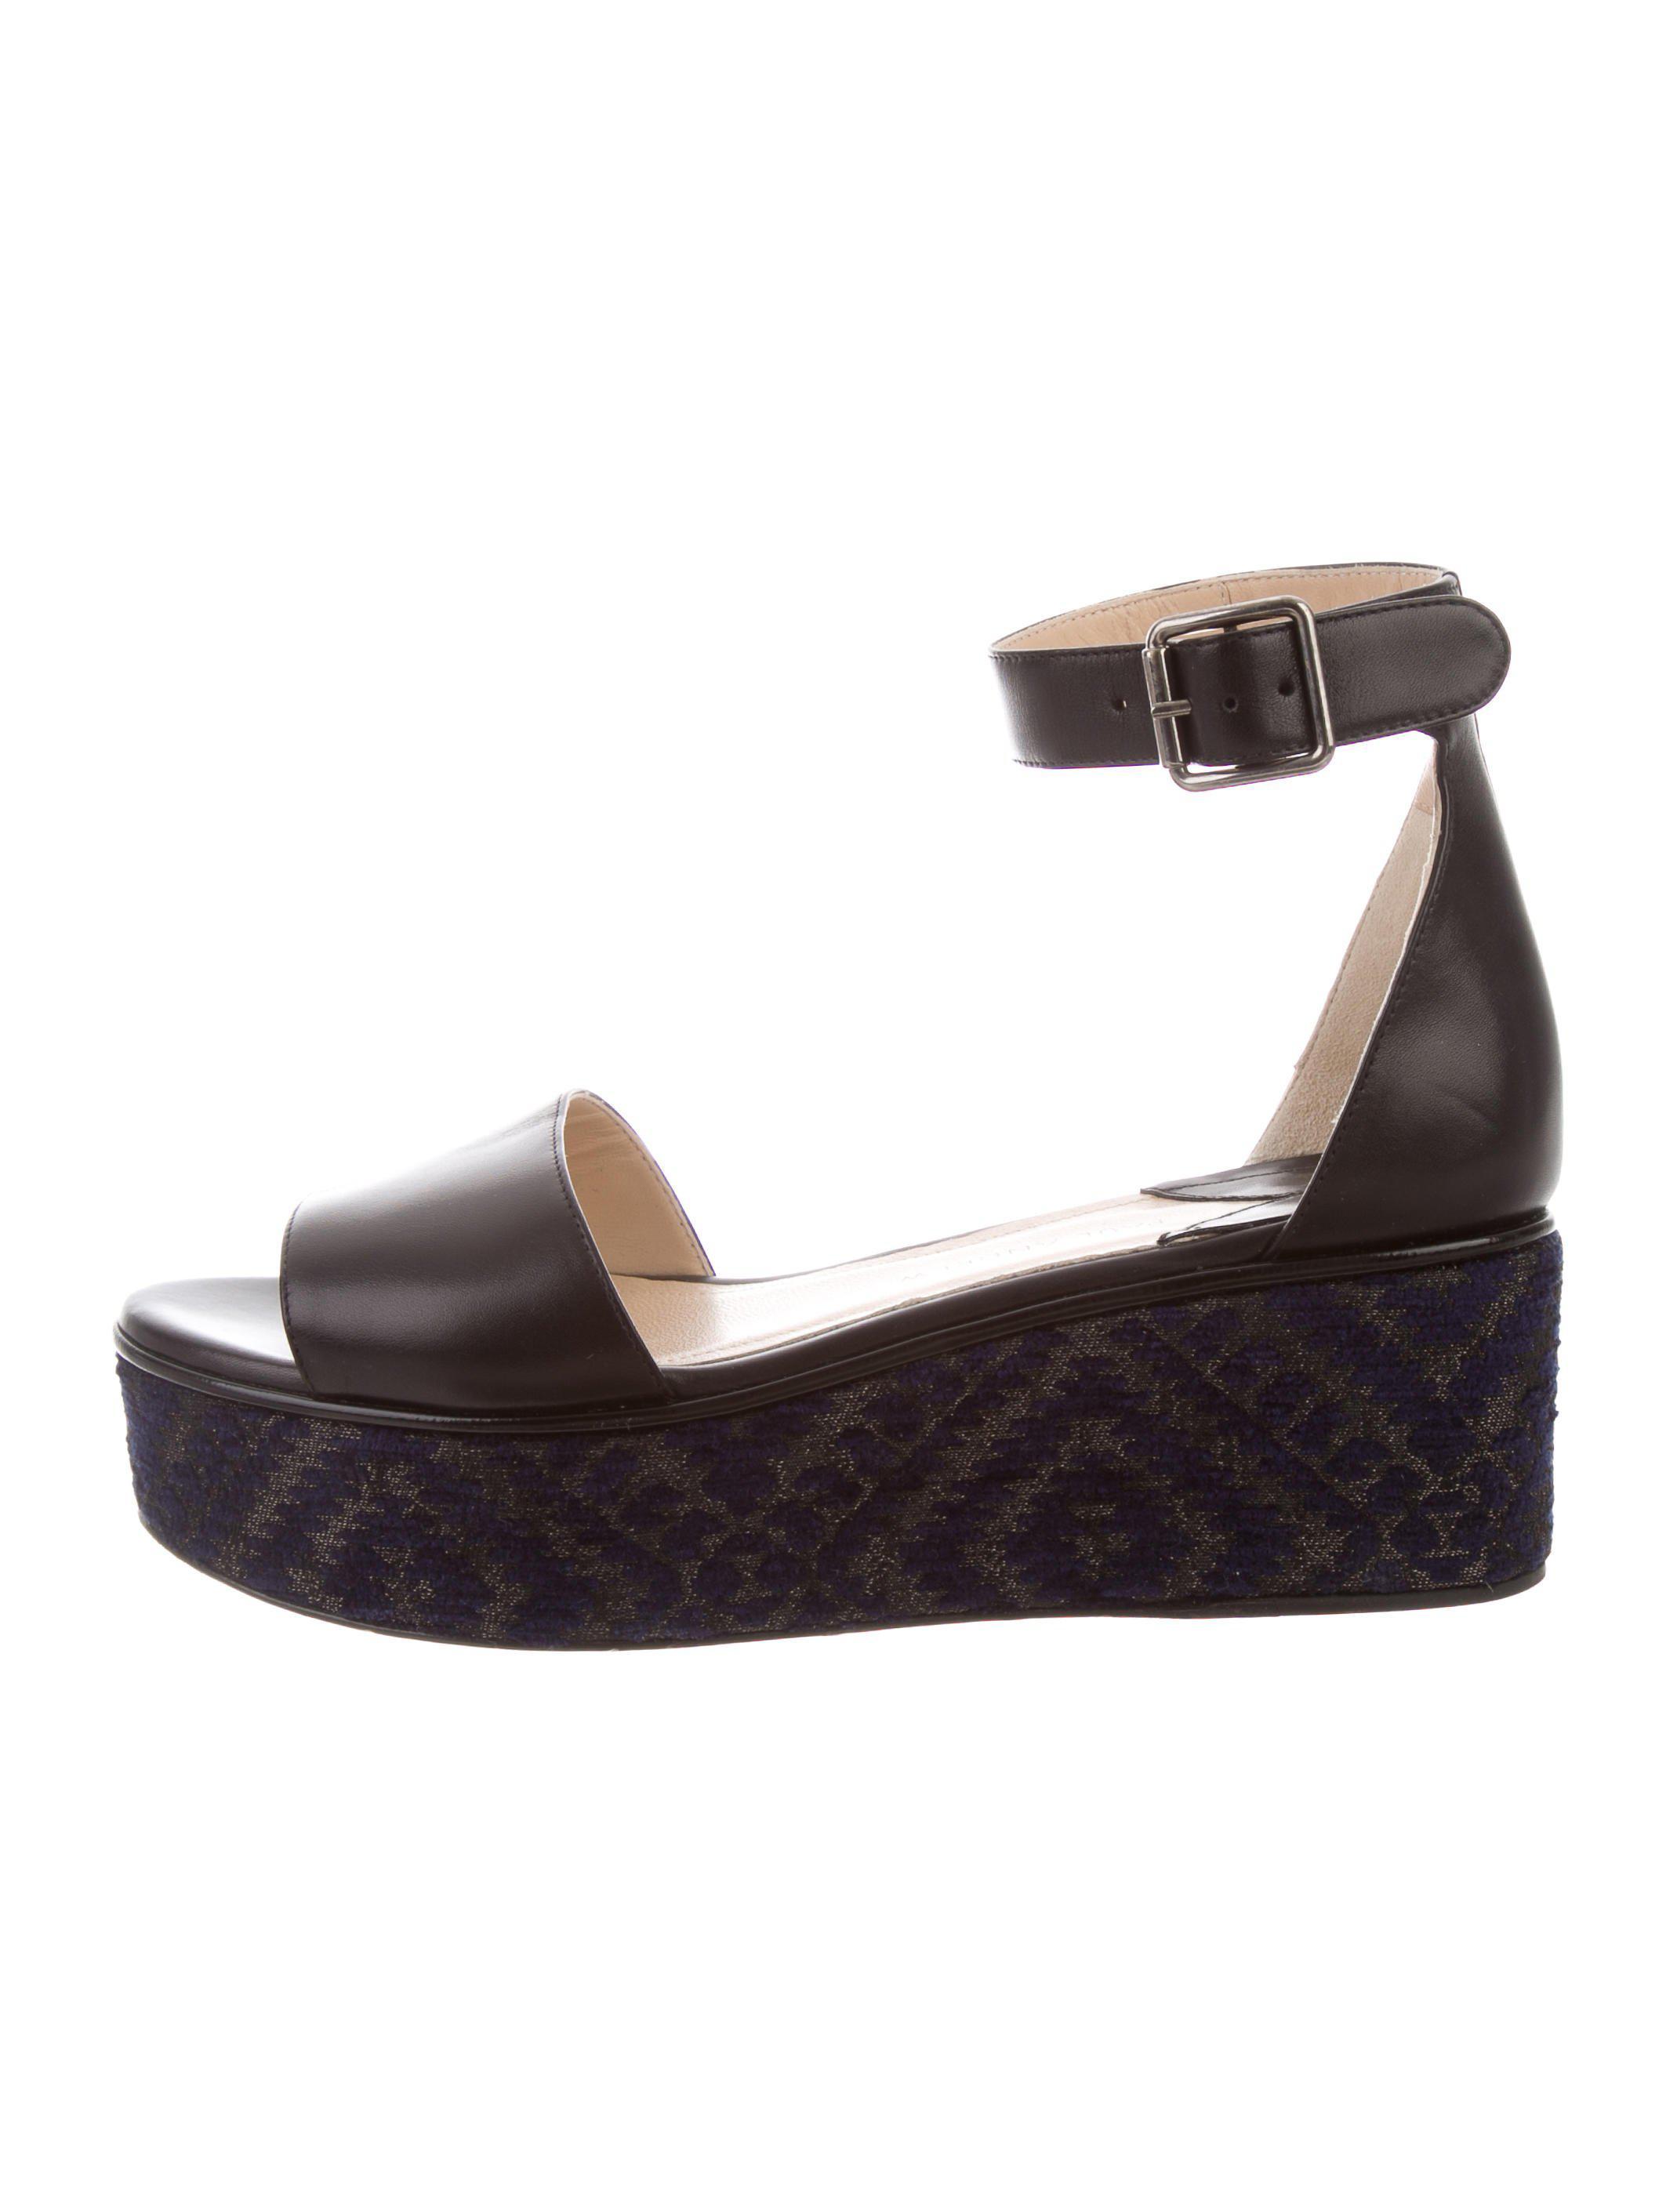 Paul Andrew Flatform Ankle Strap Sandals outlet Cheapest hCNtCqFjU